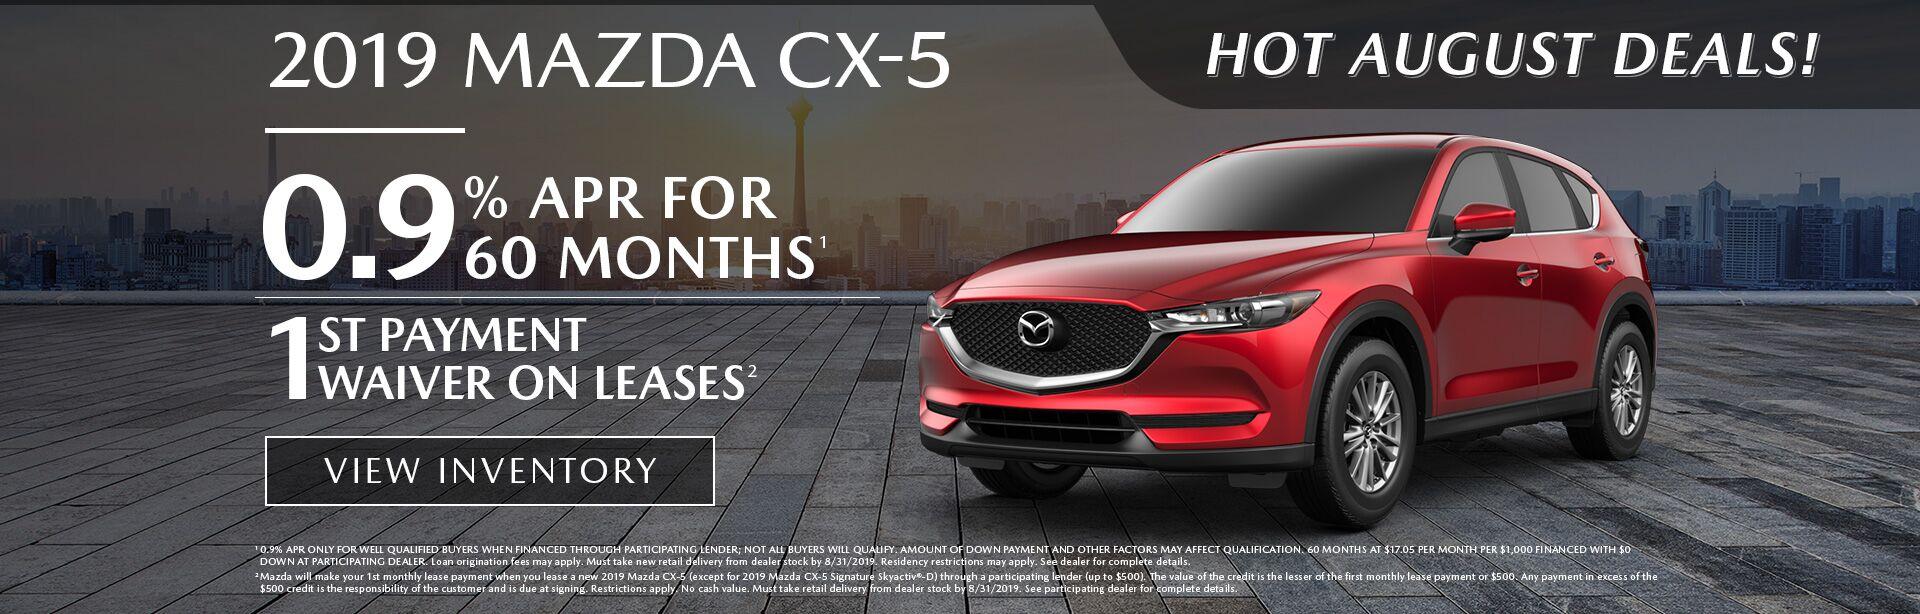 Mazda Dealer In Peoria Near Phoenix Serving Scottsdale And Scottsdale